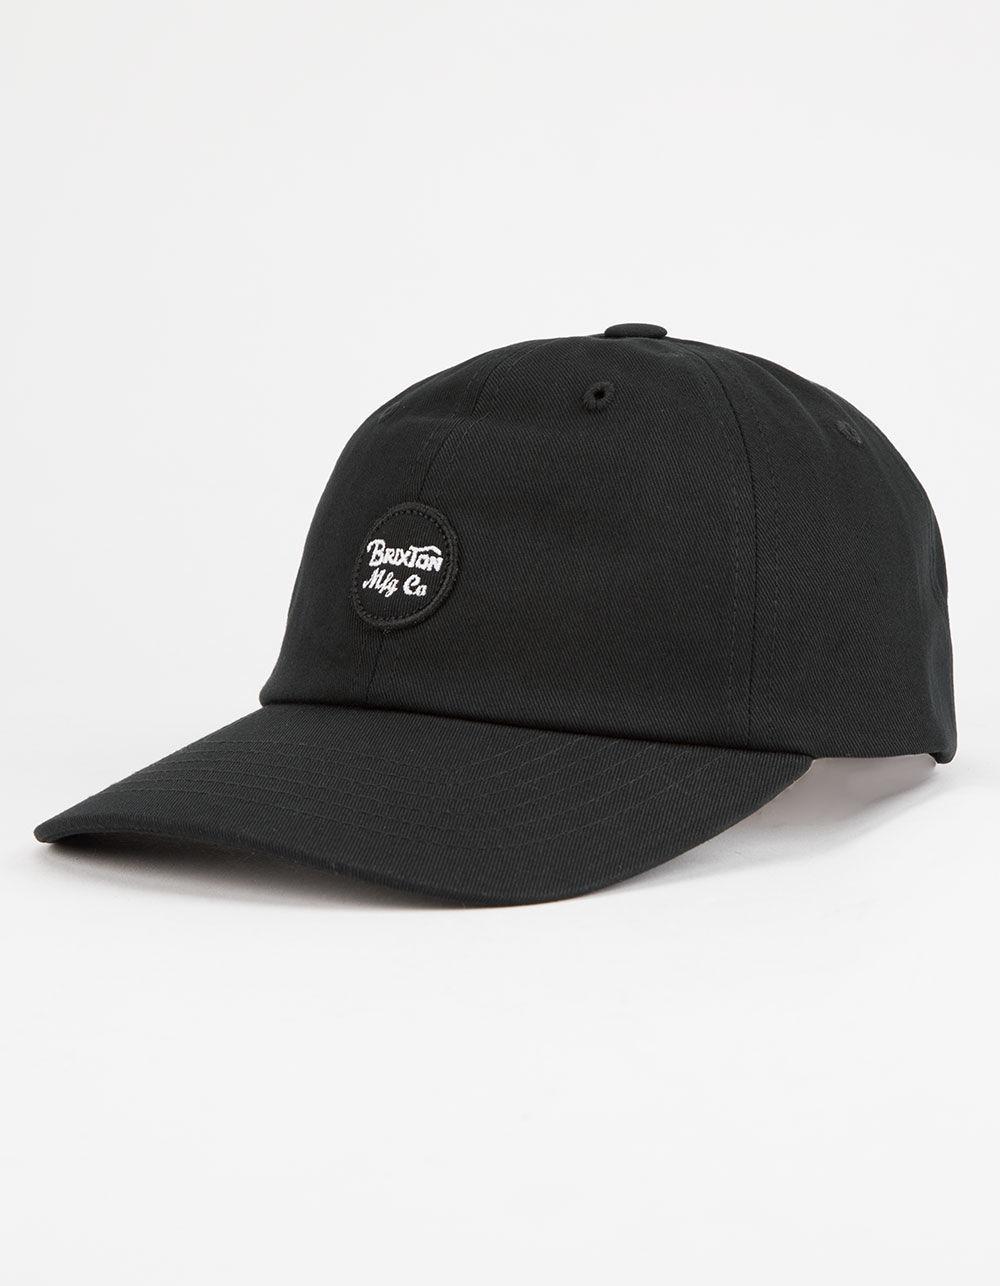 931c30f40cb Lyst - Brixton Wheeler Black Mens Strapback Hat in Black for Men